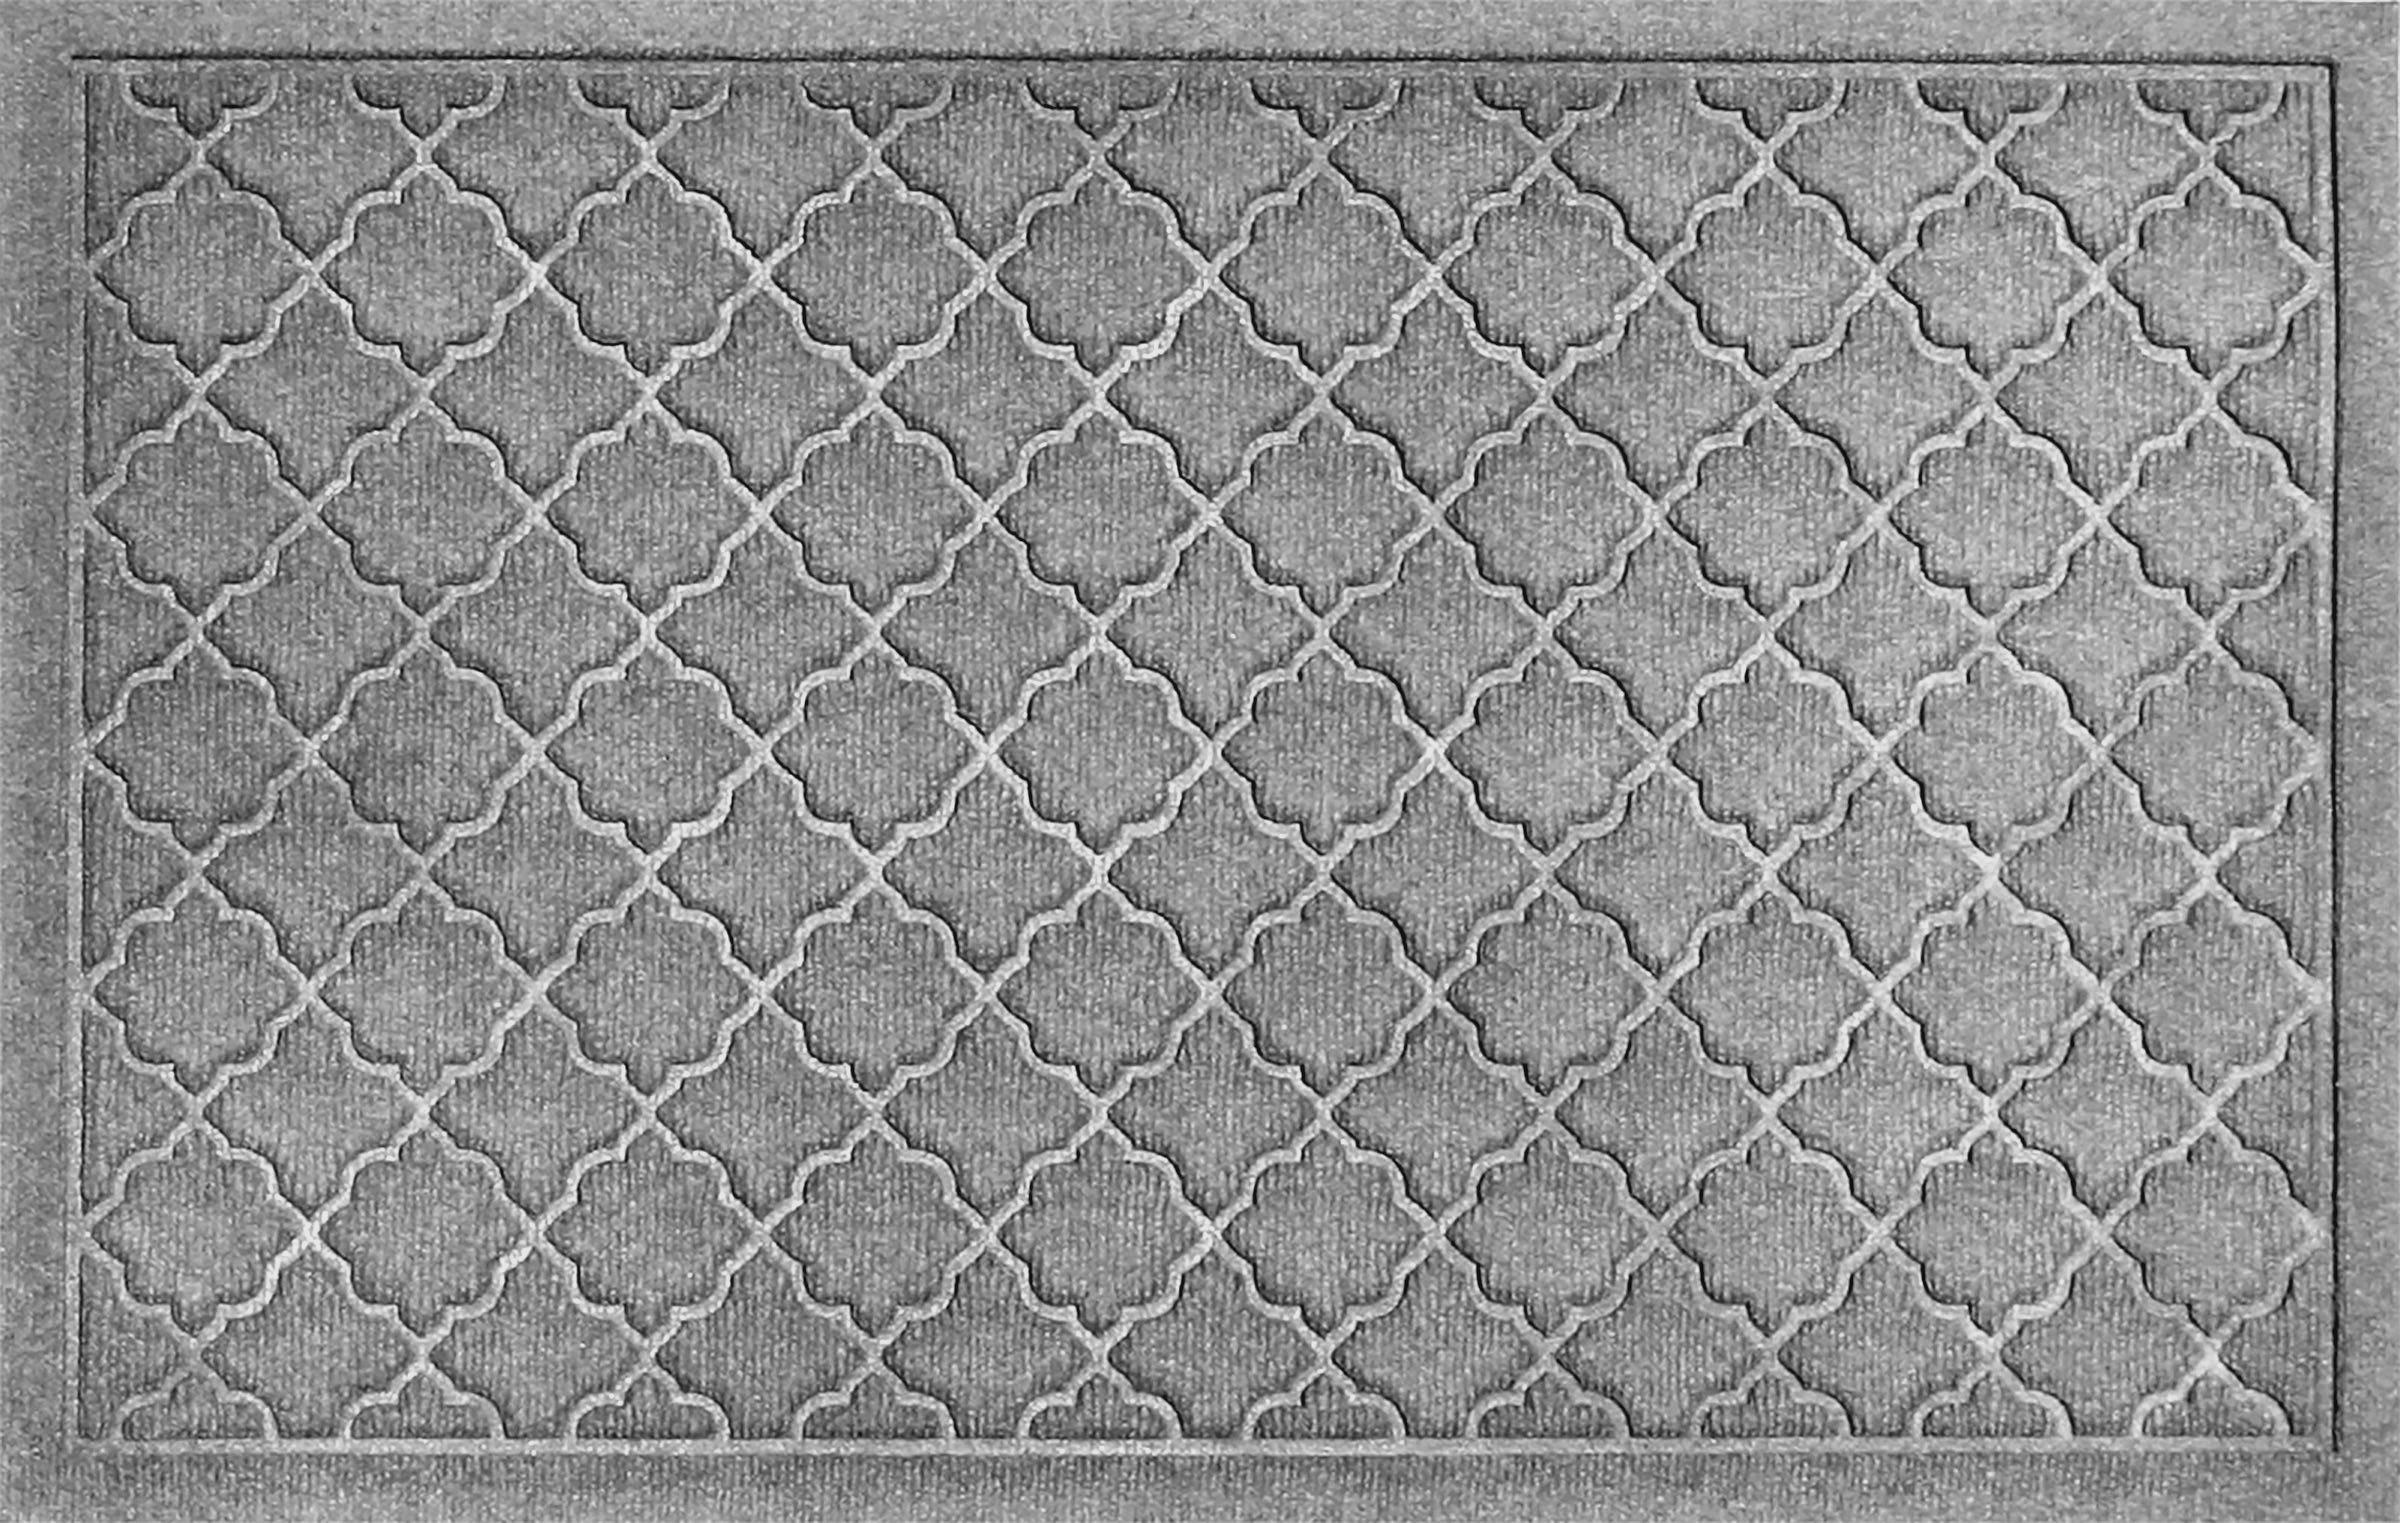 Bungalow Flooring Waterhog Doormat, 2' x 3', Skid Resistant, Easy to Clean, Catches Water and Debris, Cordova Collection, Medium Grey